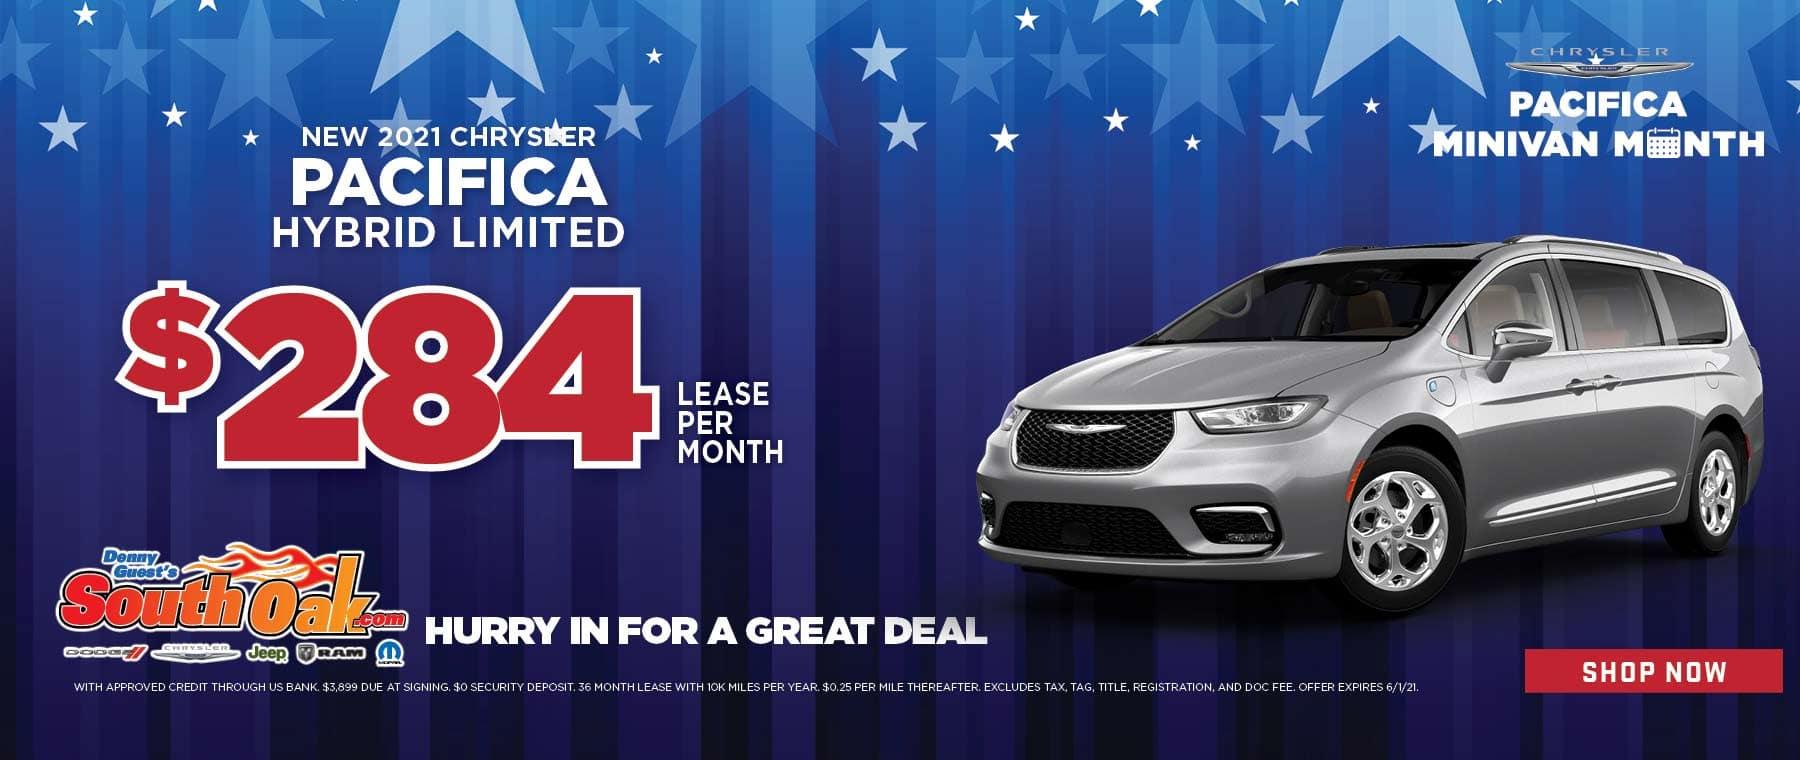 2021 Chrysler Pacifica Hybrid Lease Deal